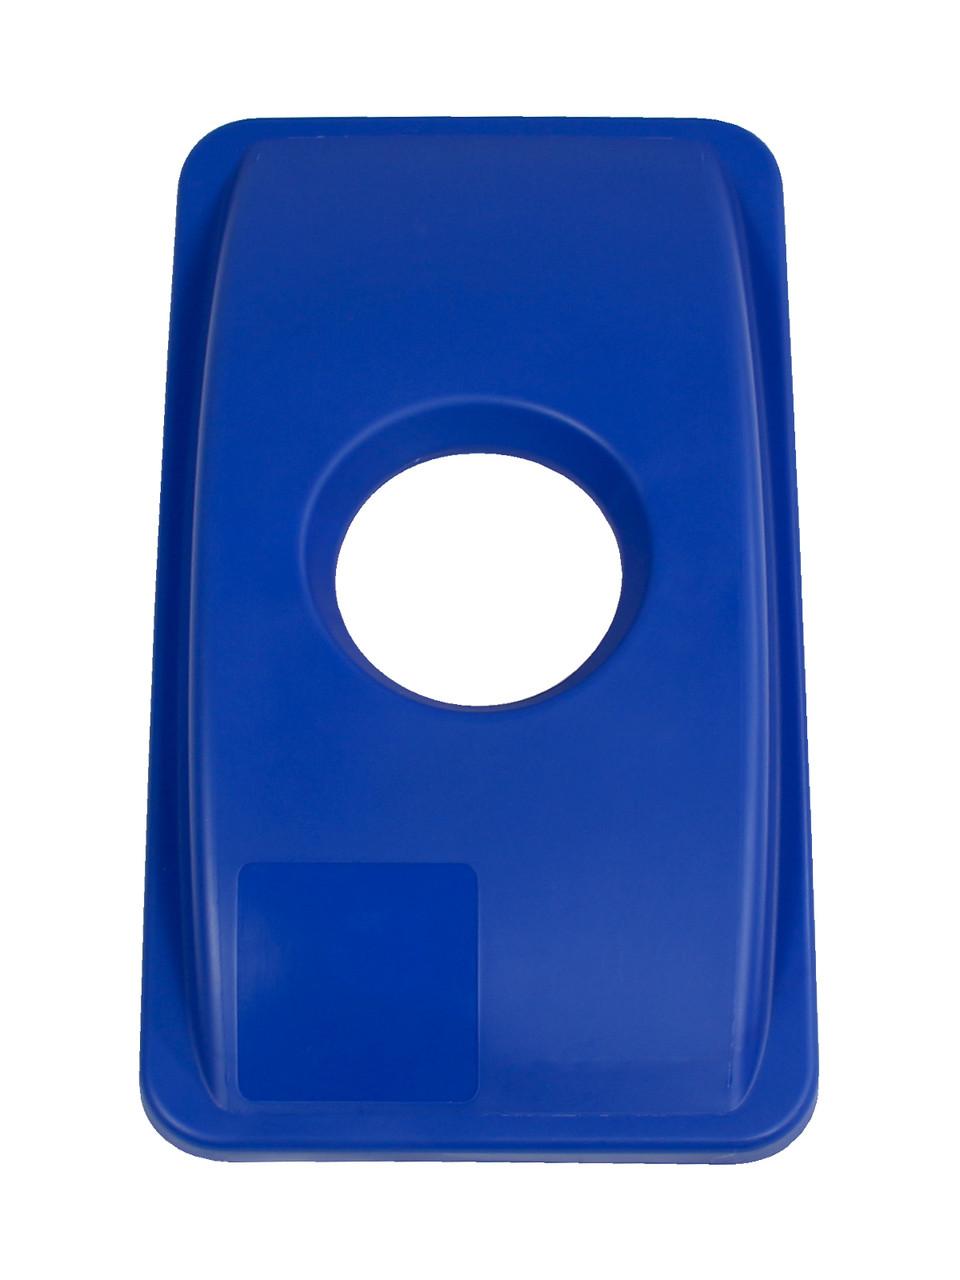 CIRCLE OPENING LID BLUE